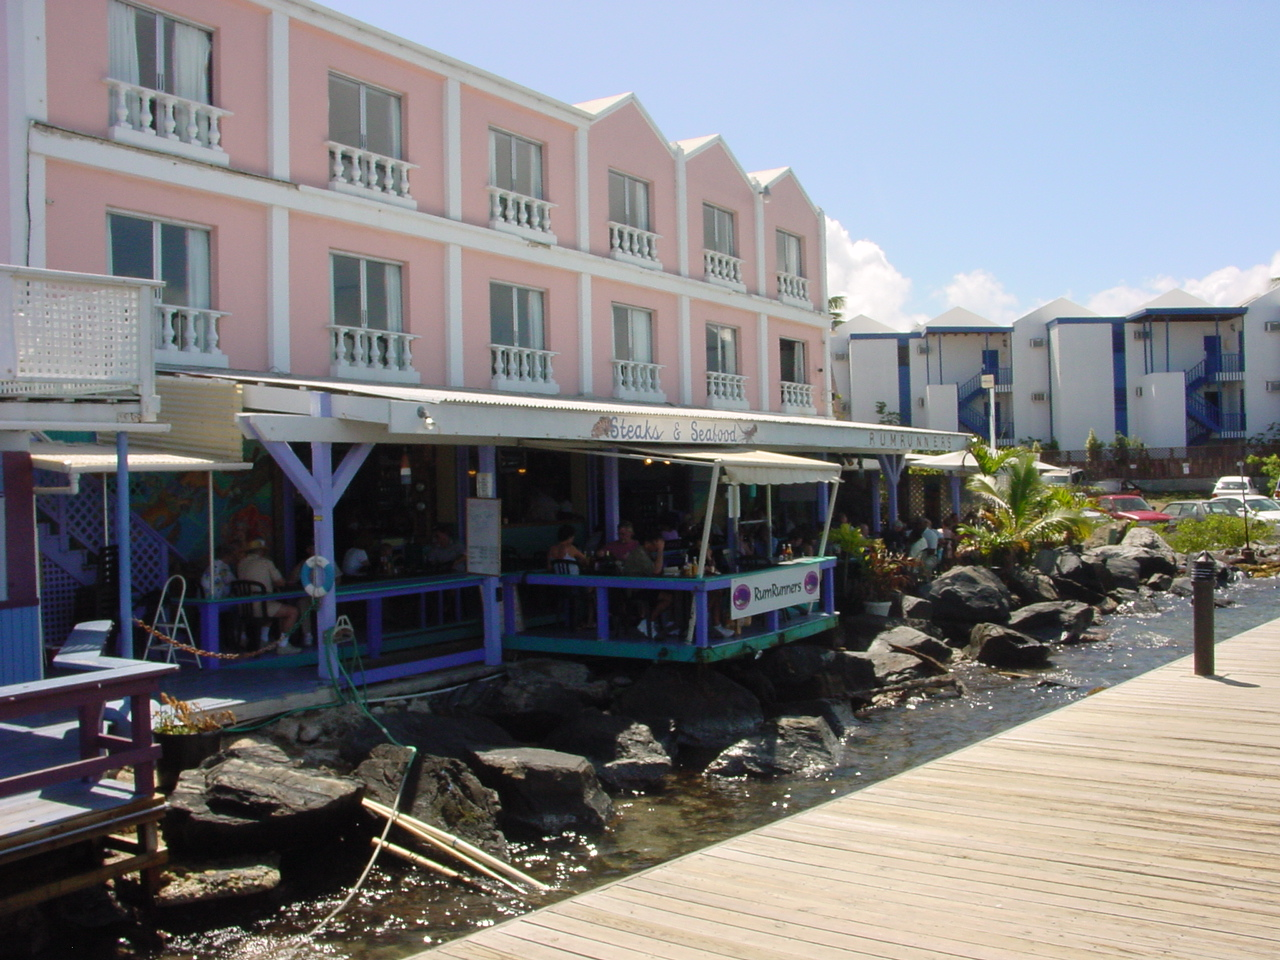 St Croix Wi Restaurants